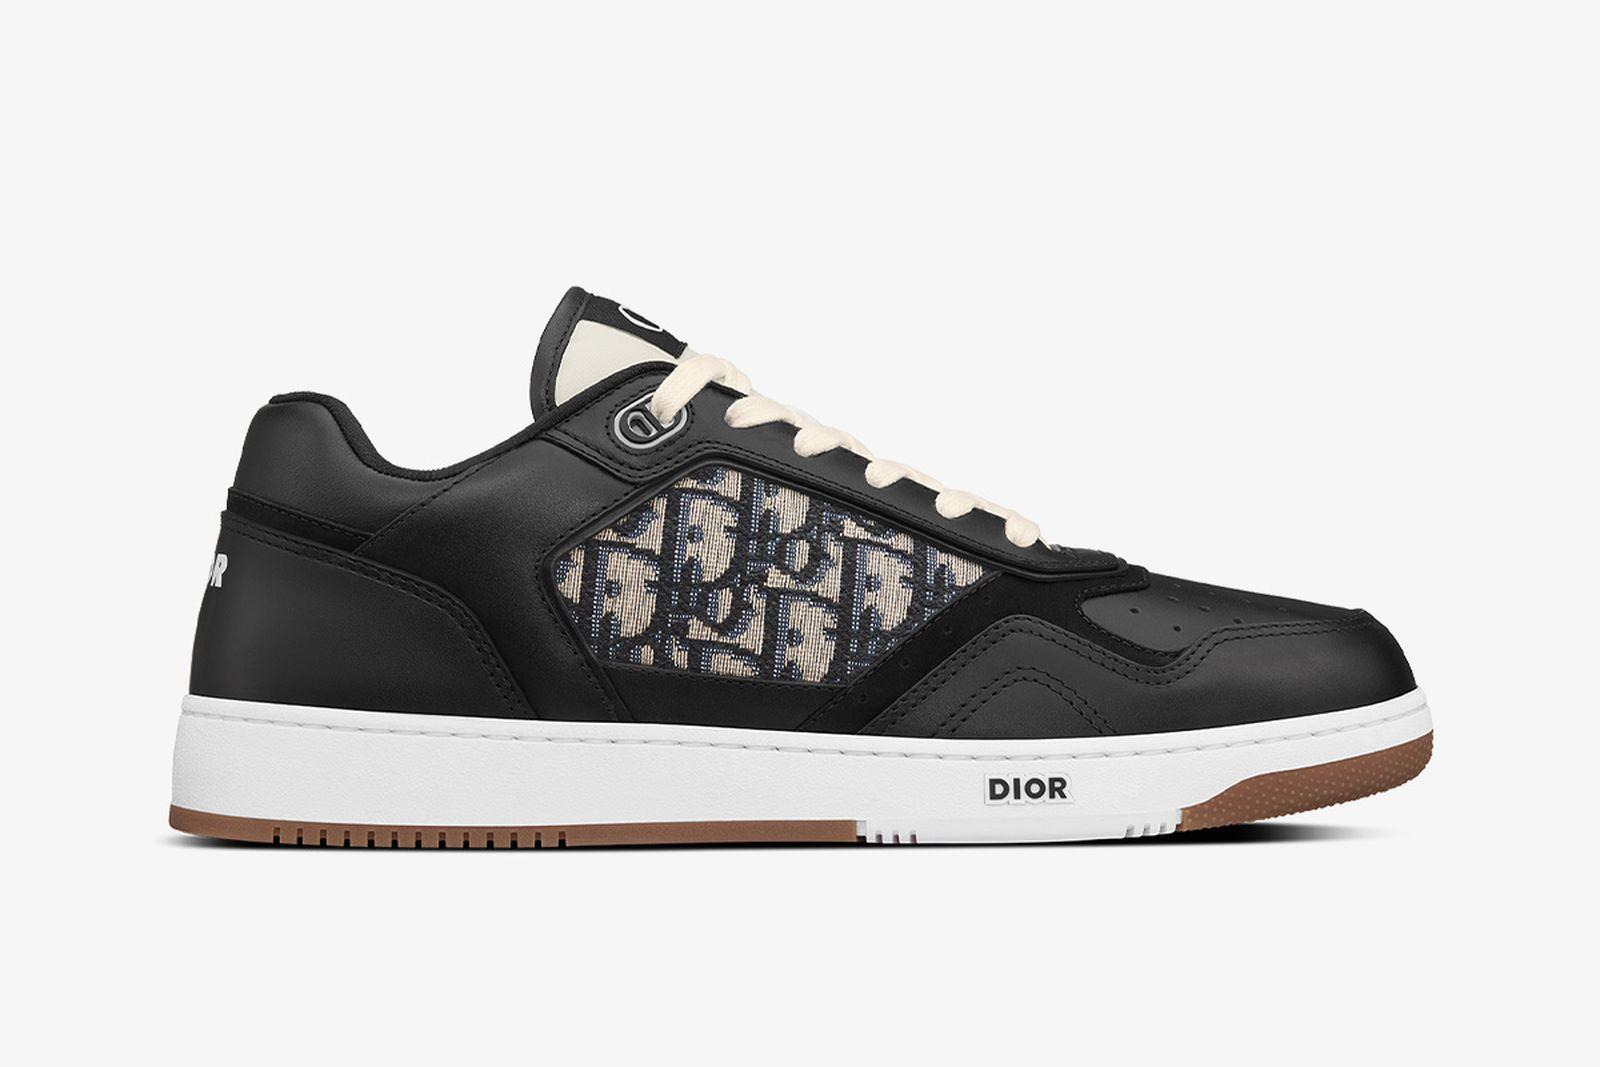 dior-b27-sneaker-release-date-price-02